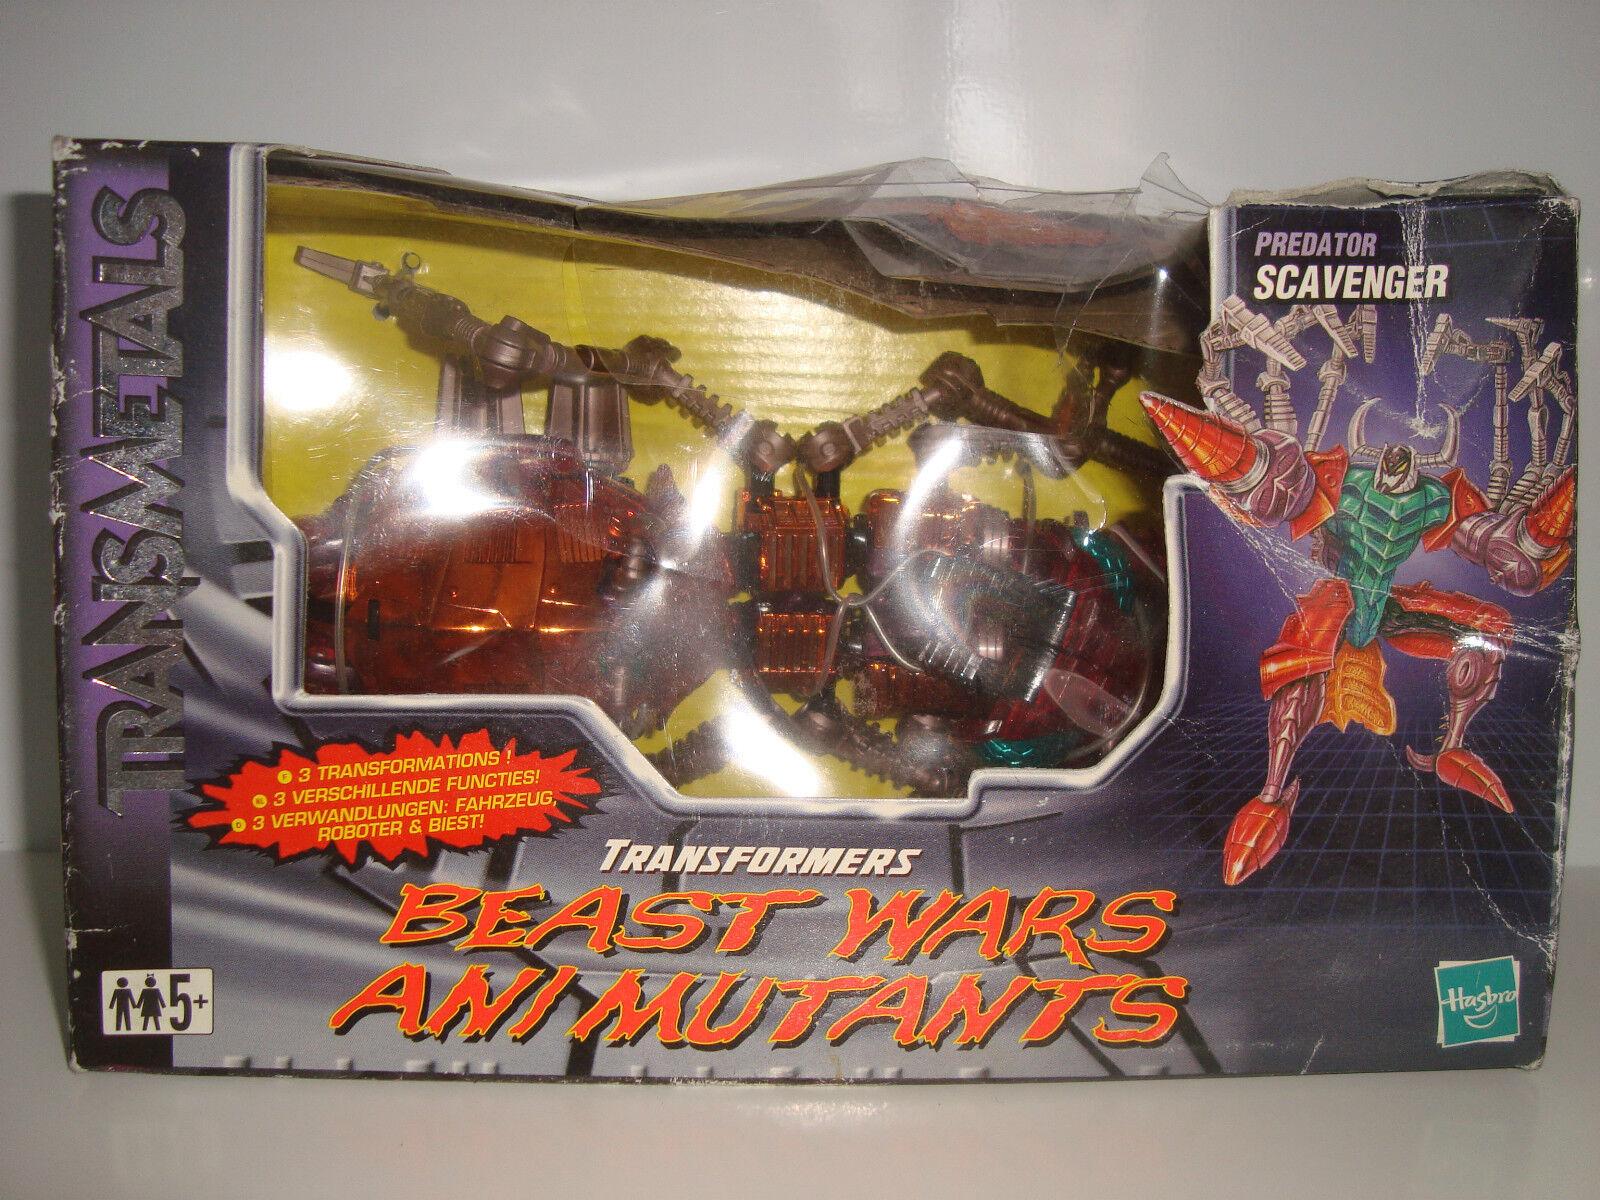 Personaggio Transformers Transmetal Predator Scavenger Beast Wars Ani Mutant